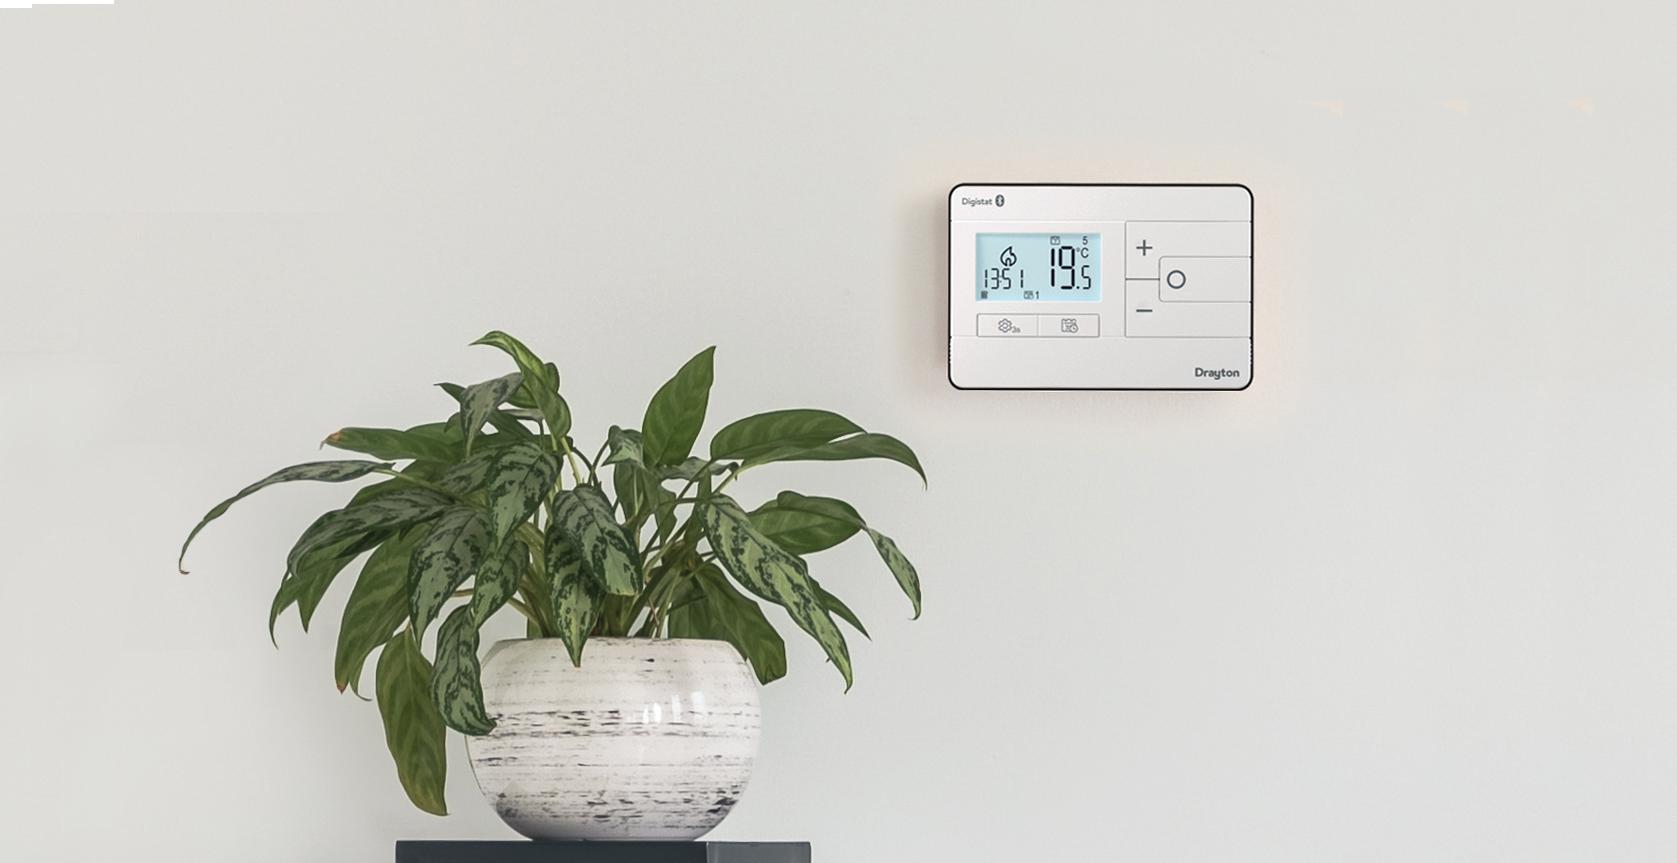 Drayton_Digistat_Thermostat_2021